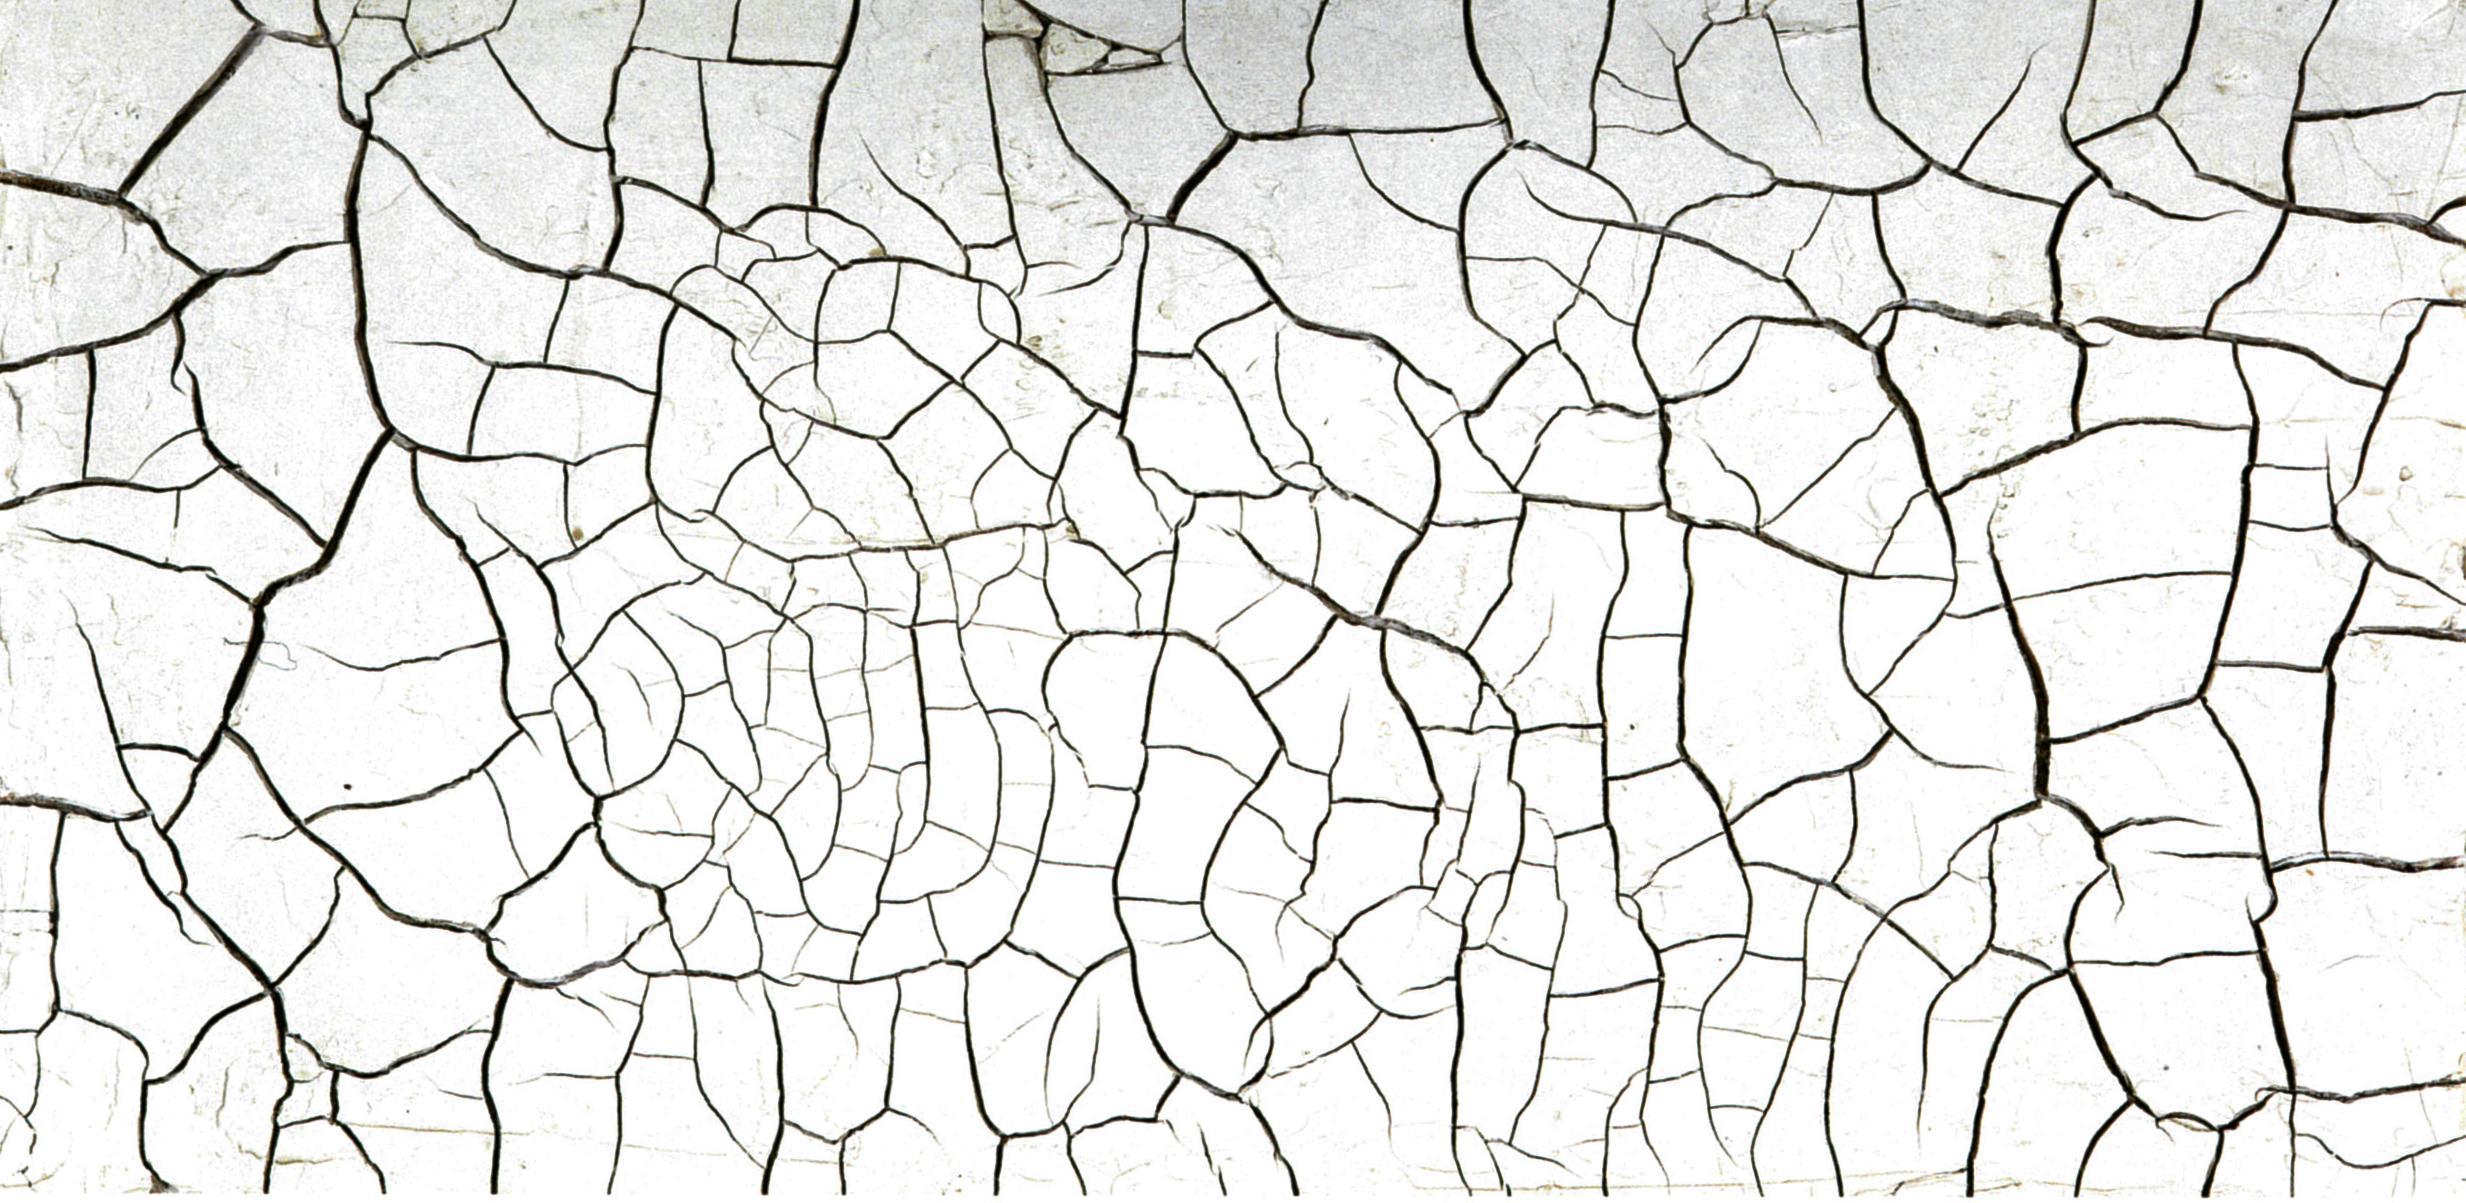 6-burri-white-cretto-1975.jpg